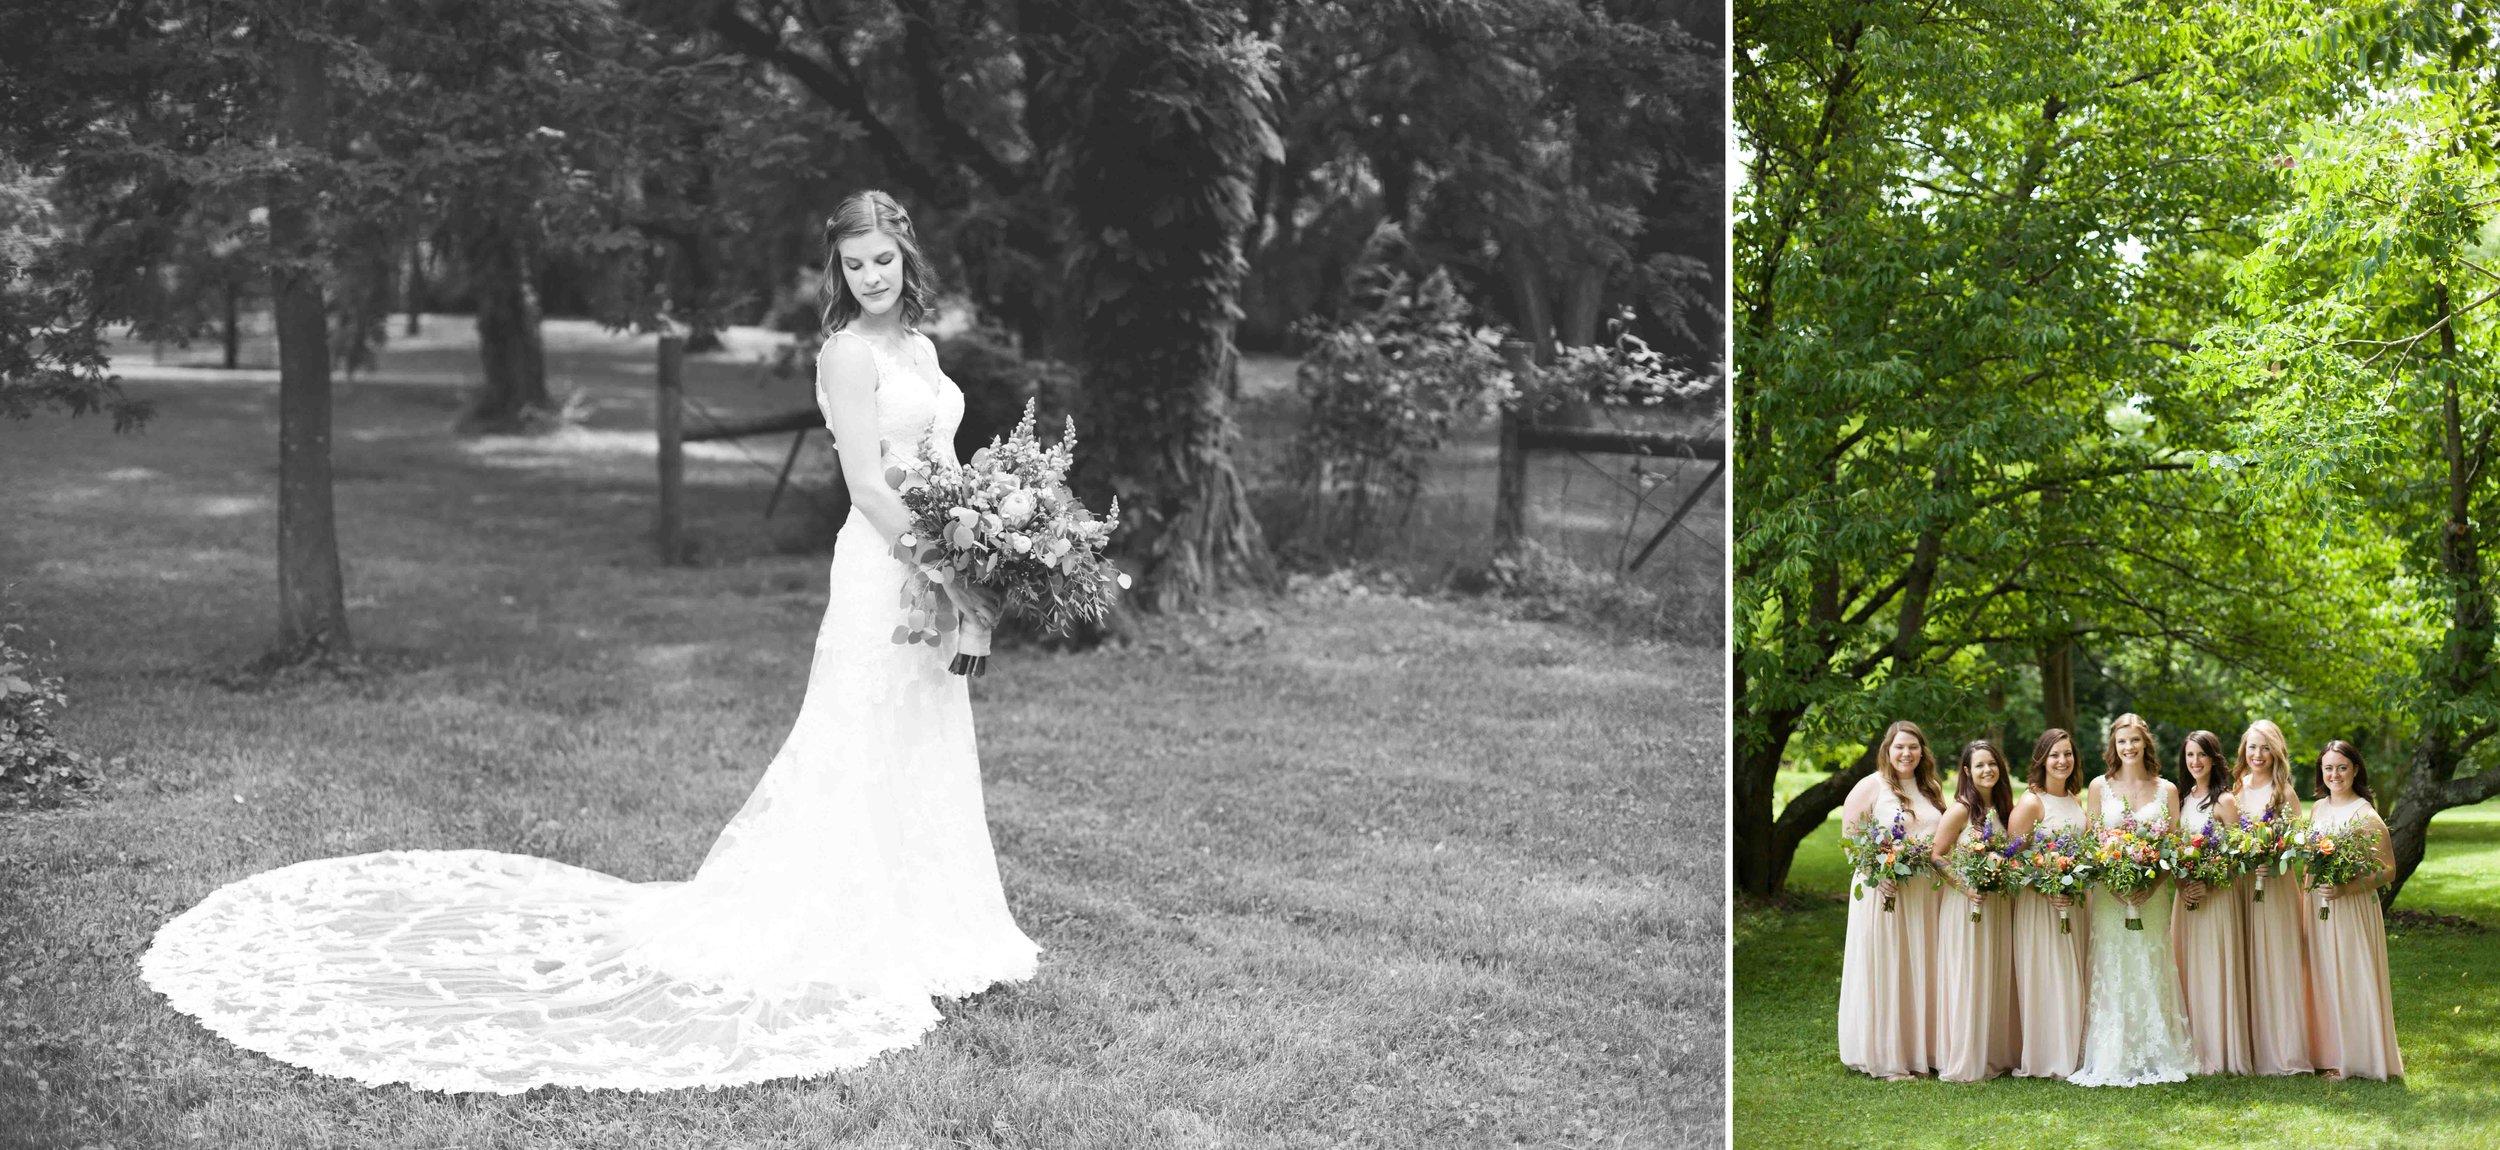 bb cincinnati wedding photographer girls0005.jpg